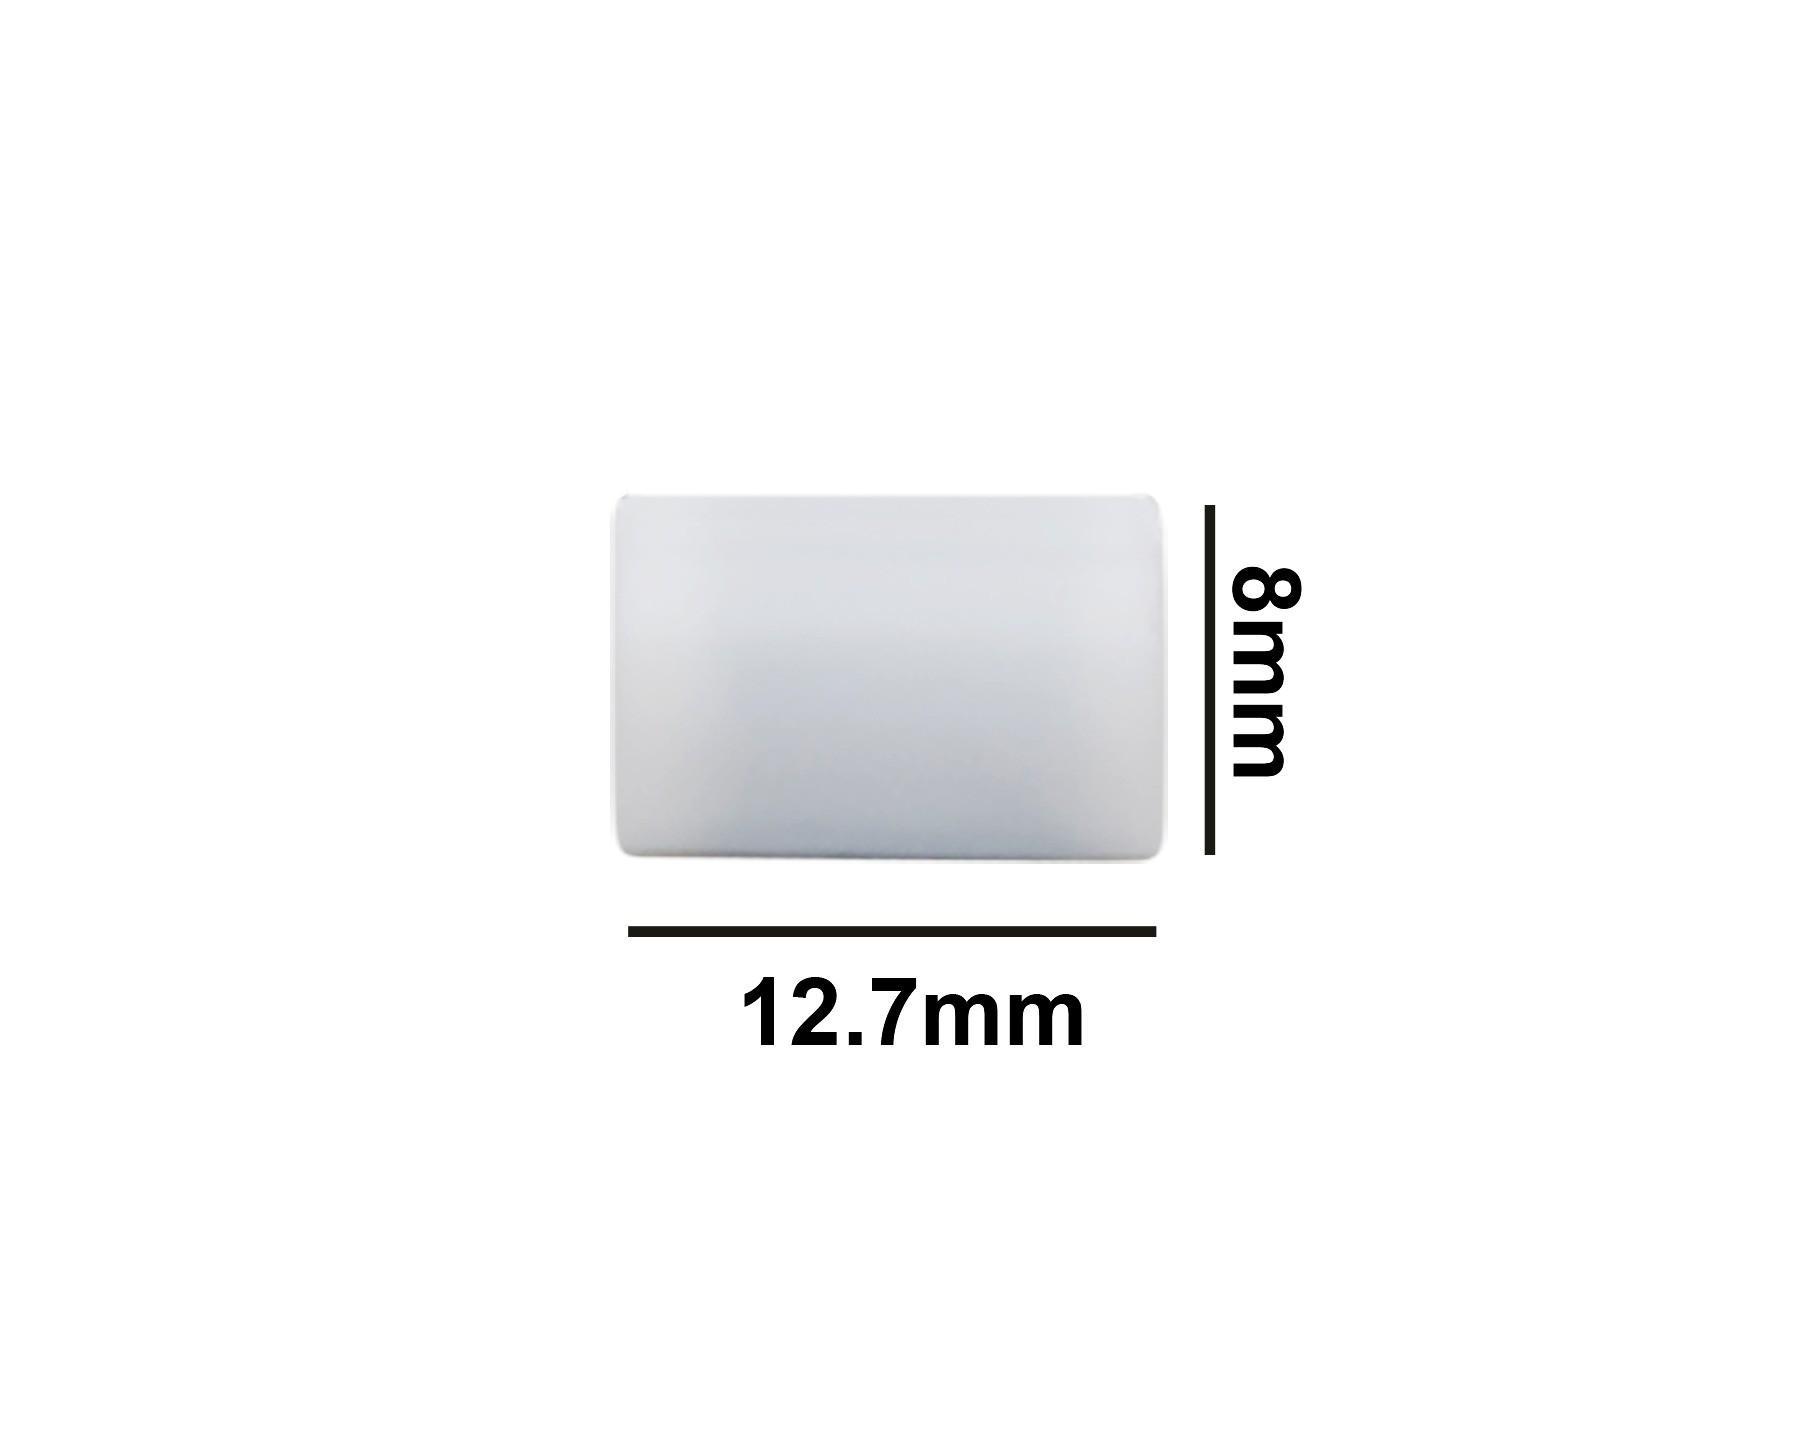 SP Bel-Art Spinbar Teflon Cylindrical Magnetic Stirring Bar; 12.7 x 8mm, White